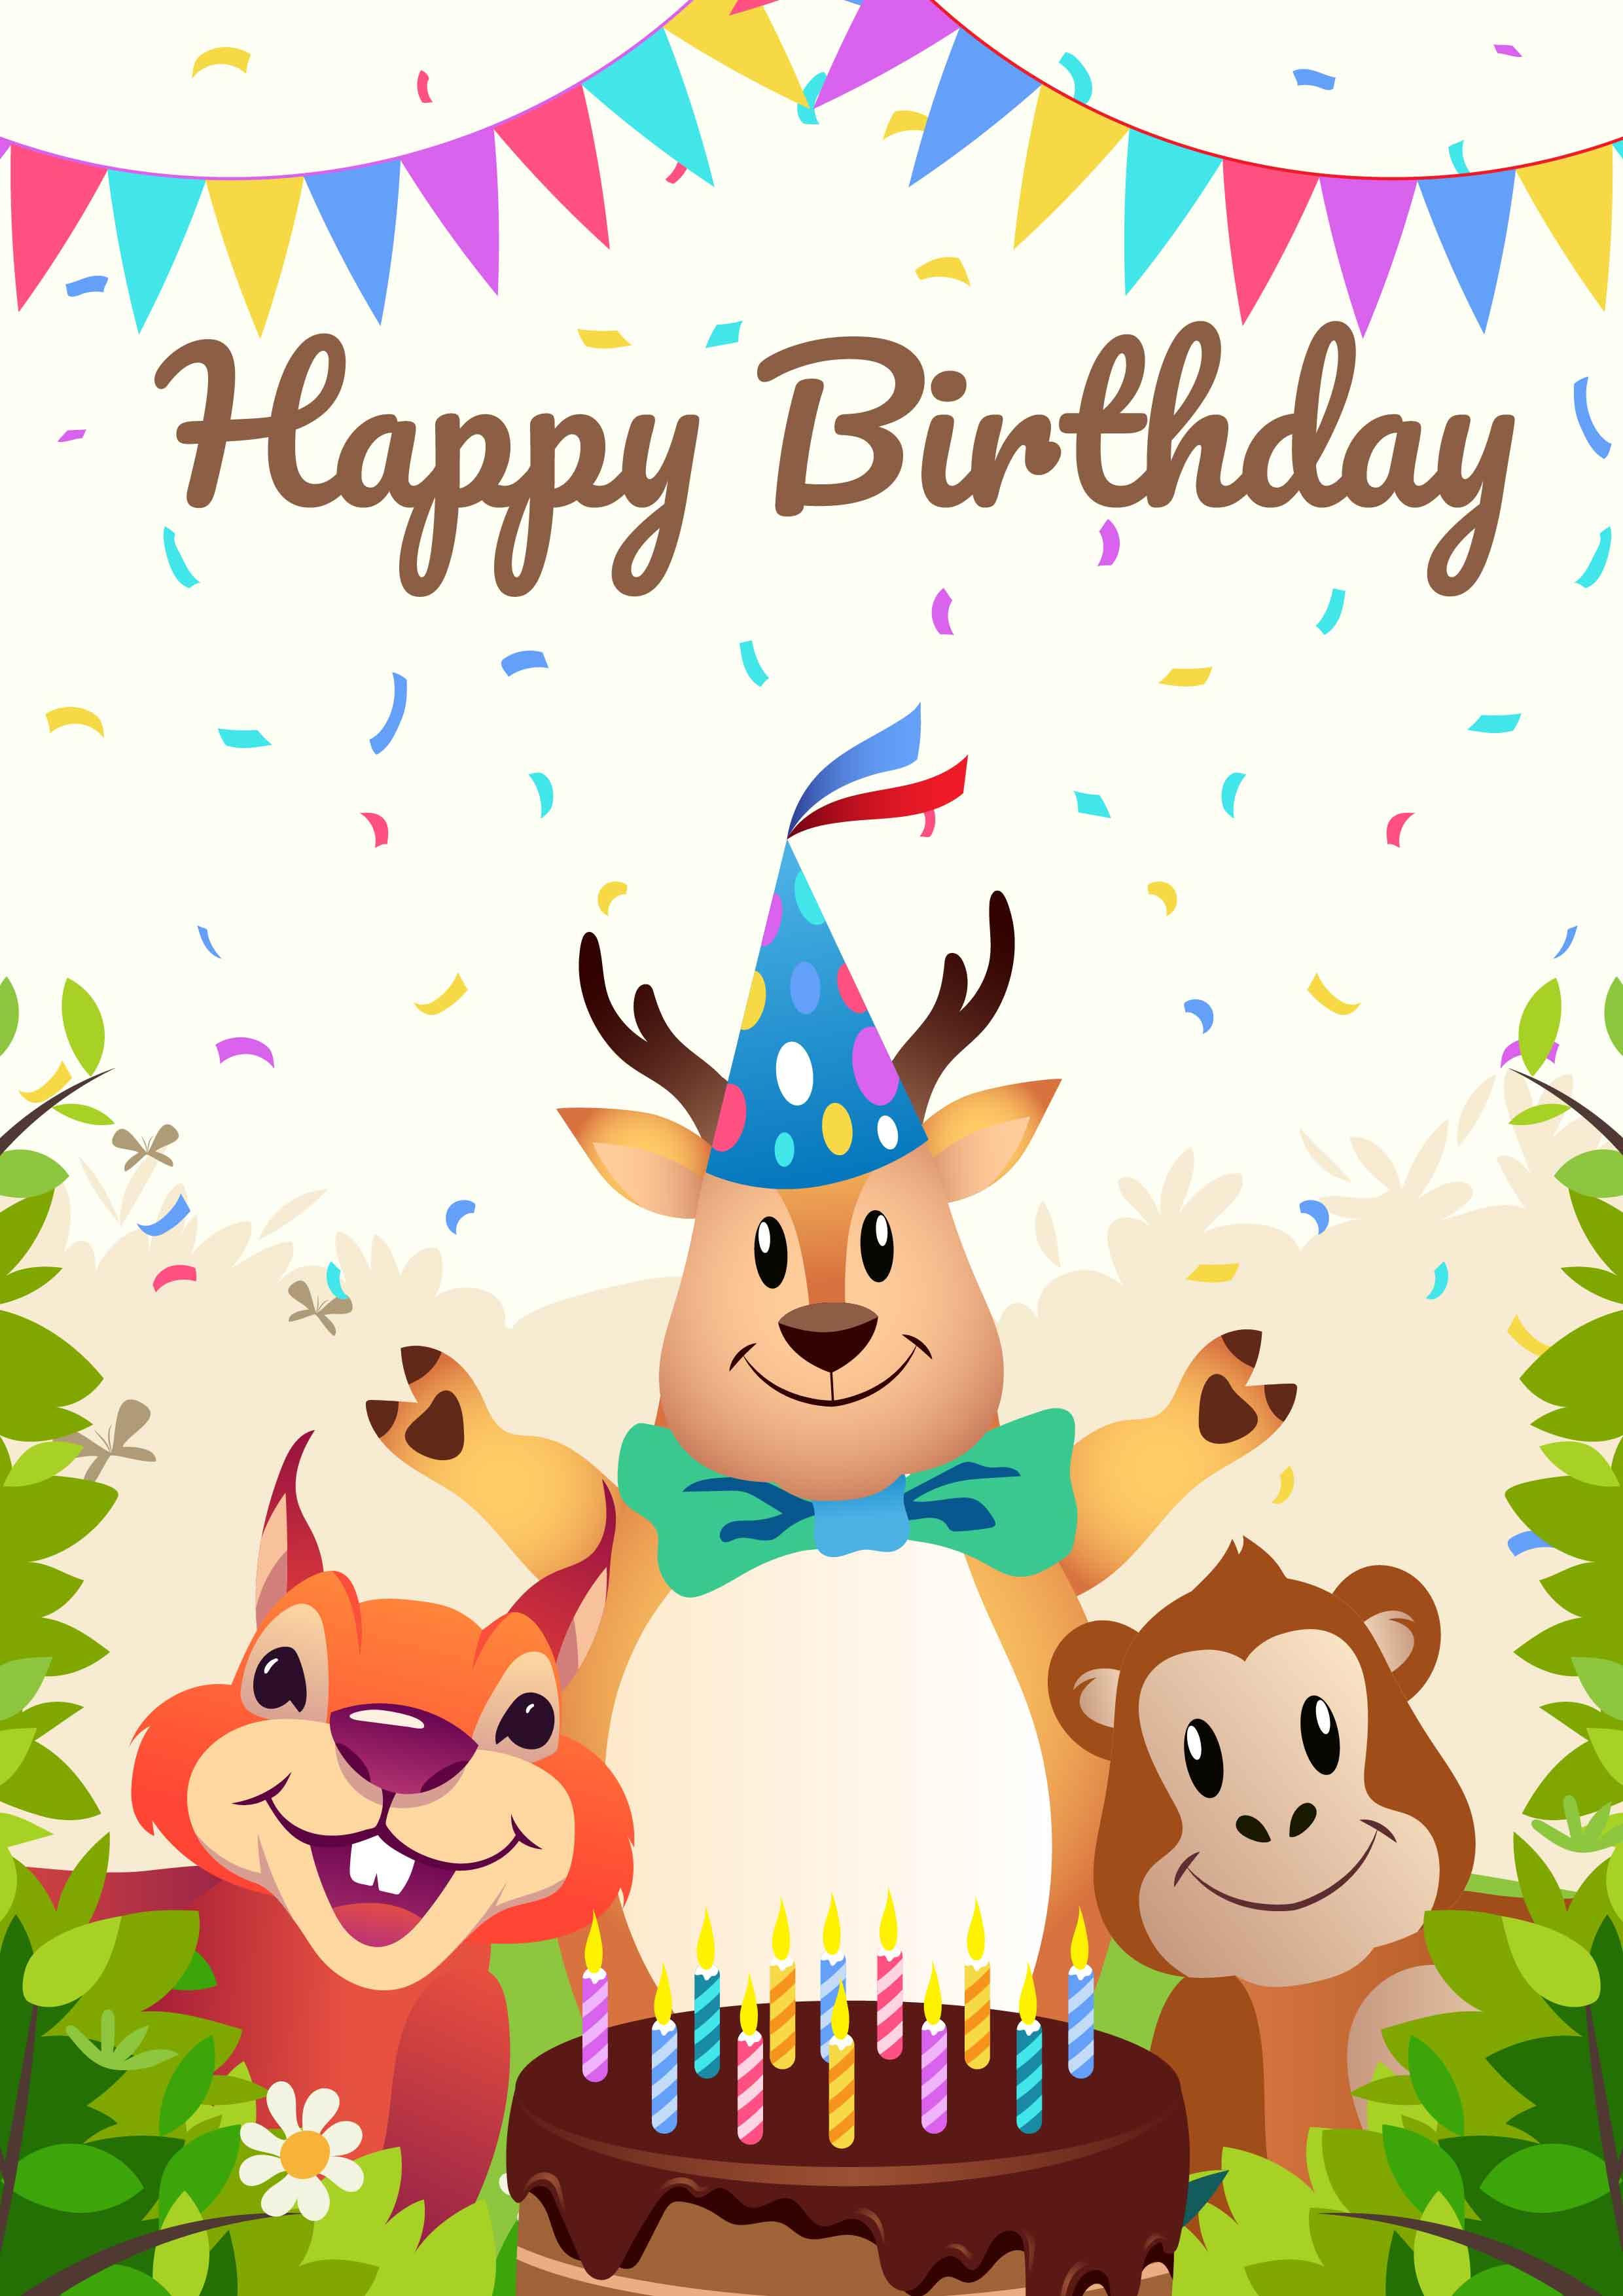 Happy Birthday Animals Party Download Free Vectors Clipart Graphics Vector Art